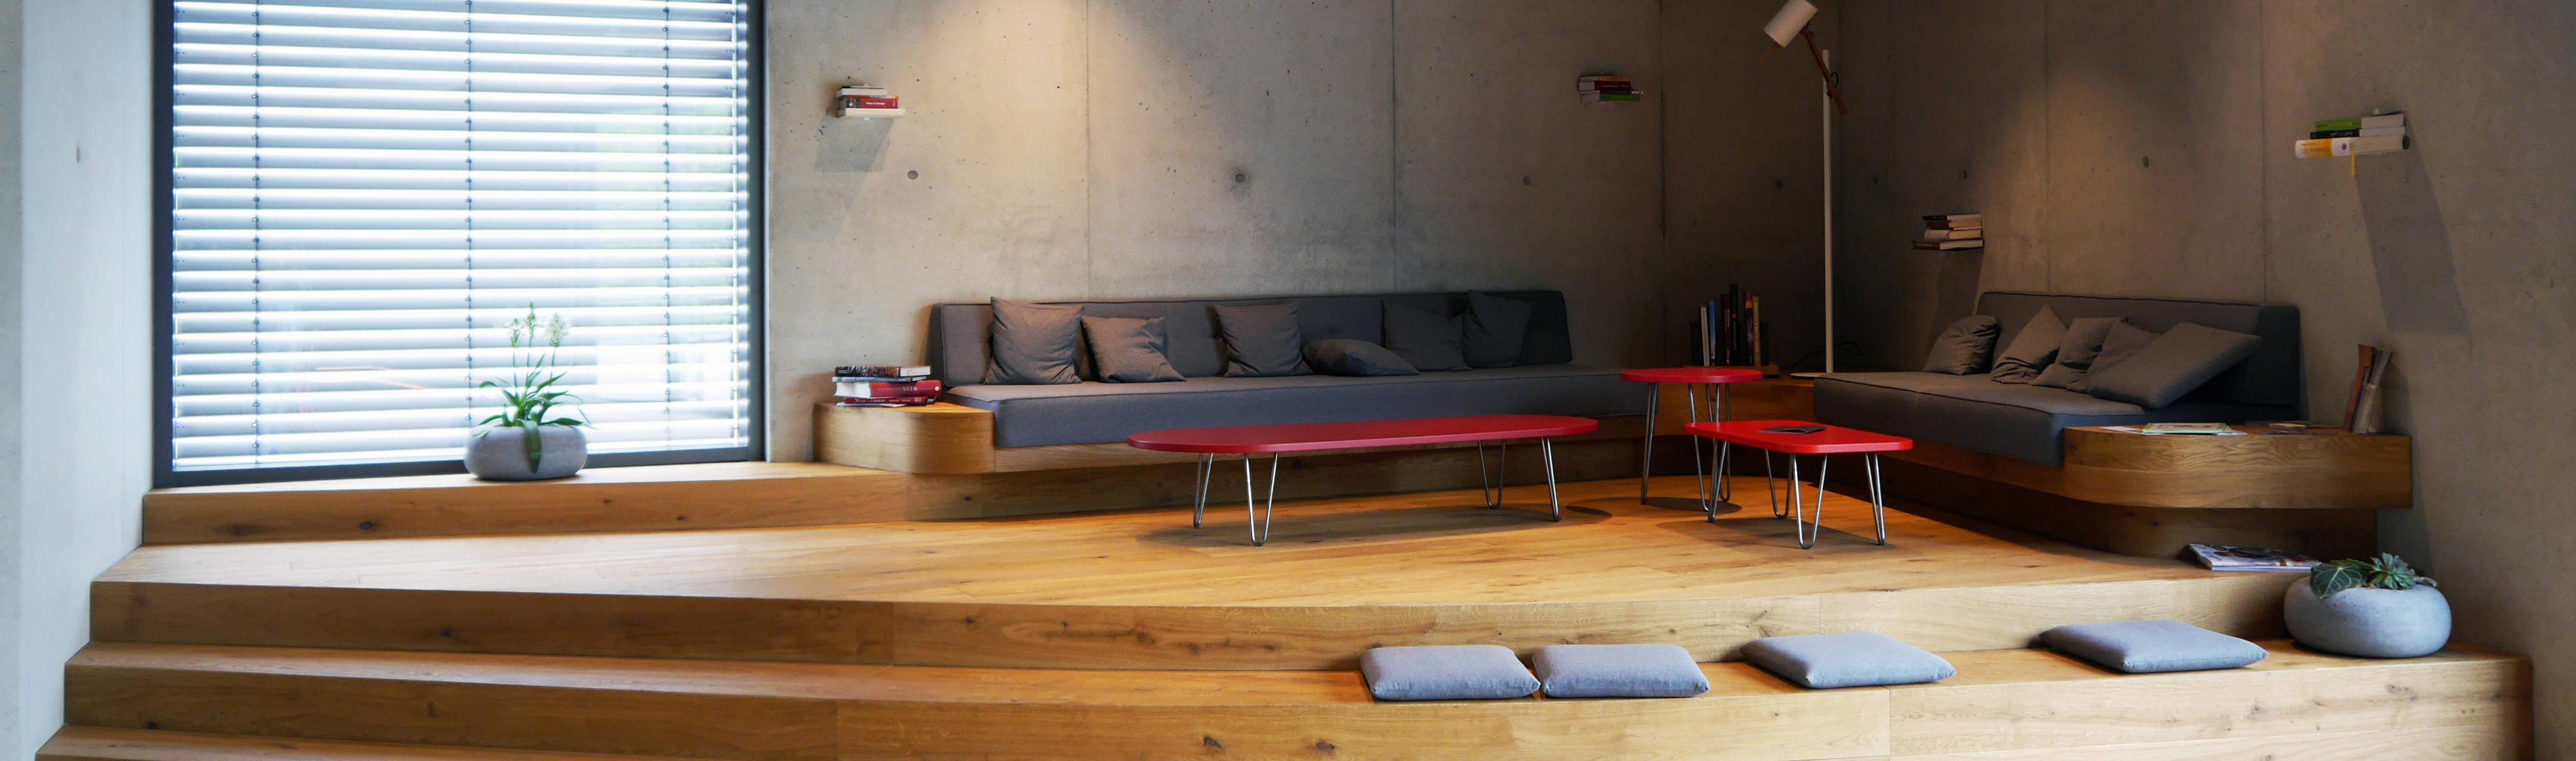 Hammer & Margrander Interior GmbH